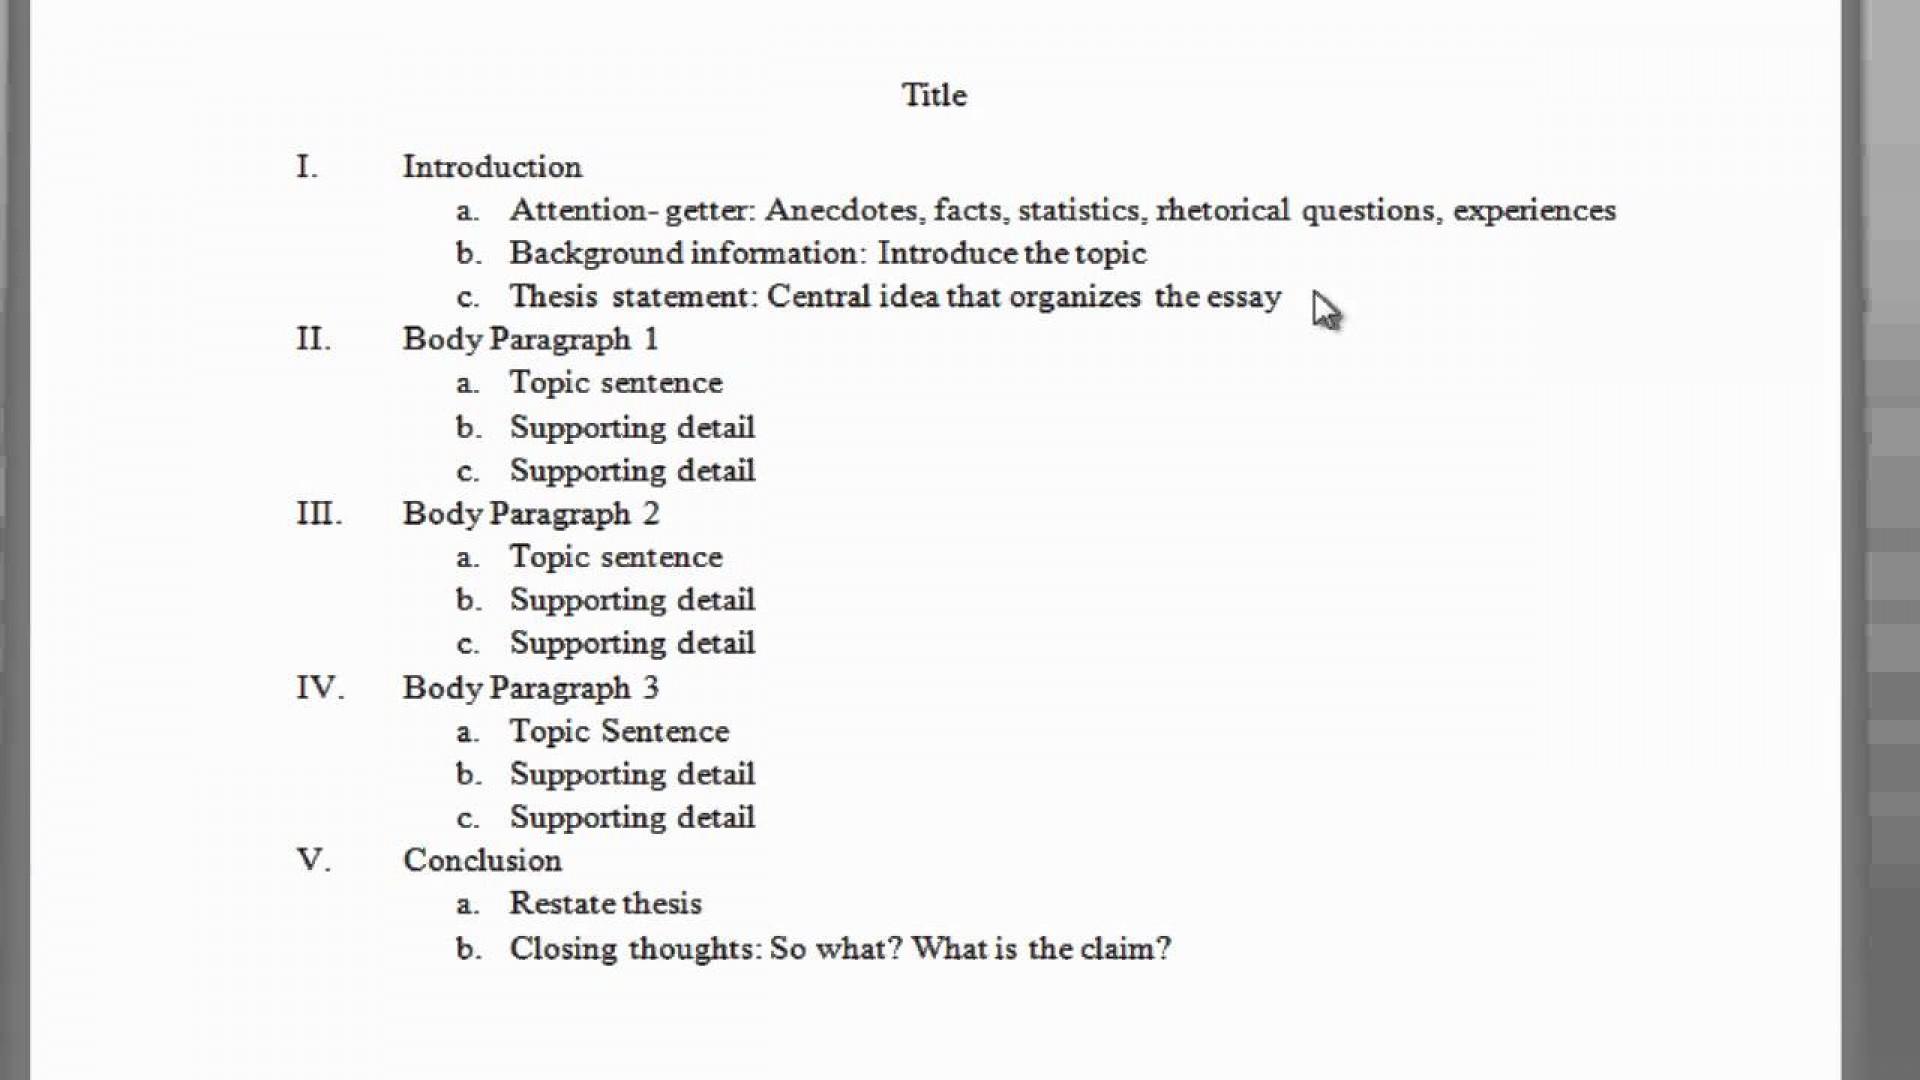 002 Maxresdefault Outline Of An Essay Sensational Argumentative Sample Co Education Pdf 1920